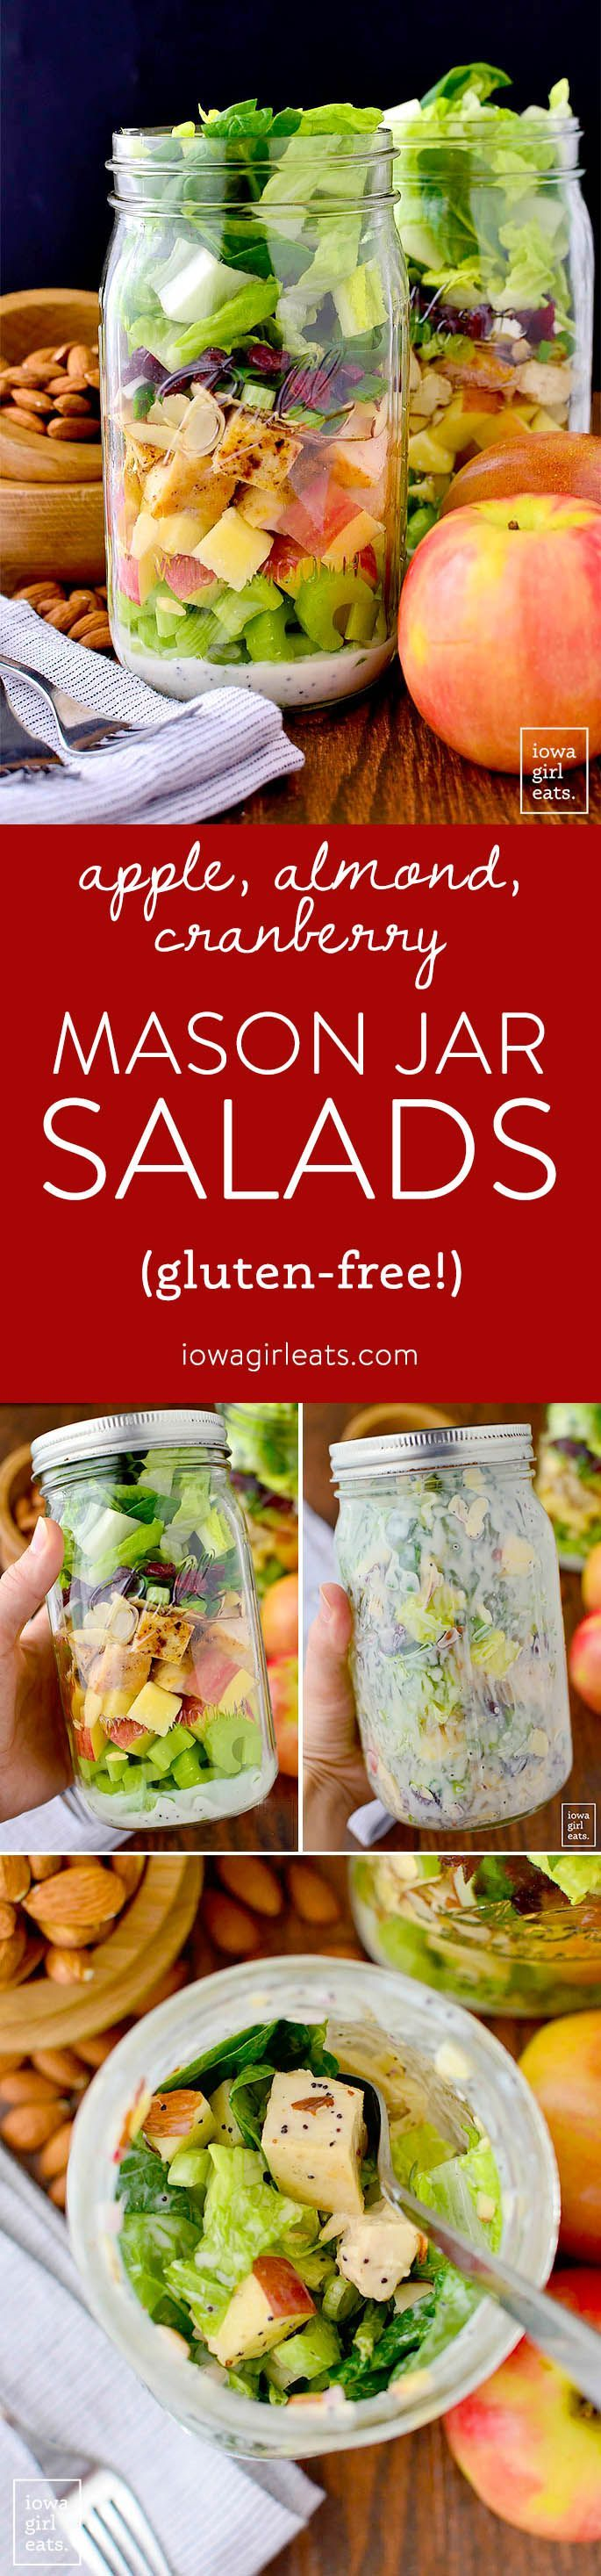 Apple, Cranberry, Almond Mason Jar Salads with homemade Greek Yogurt Poppy Seed Dressing are a fresh and healthy make-ahead lunch option! | iowagirleats.com